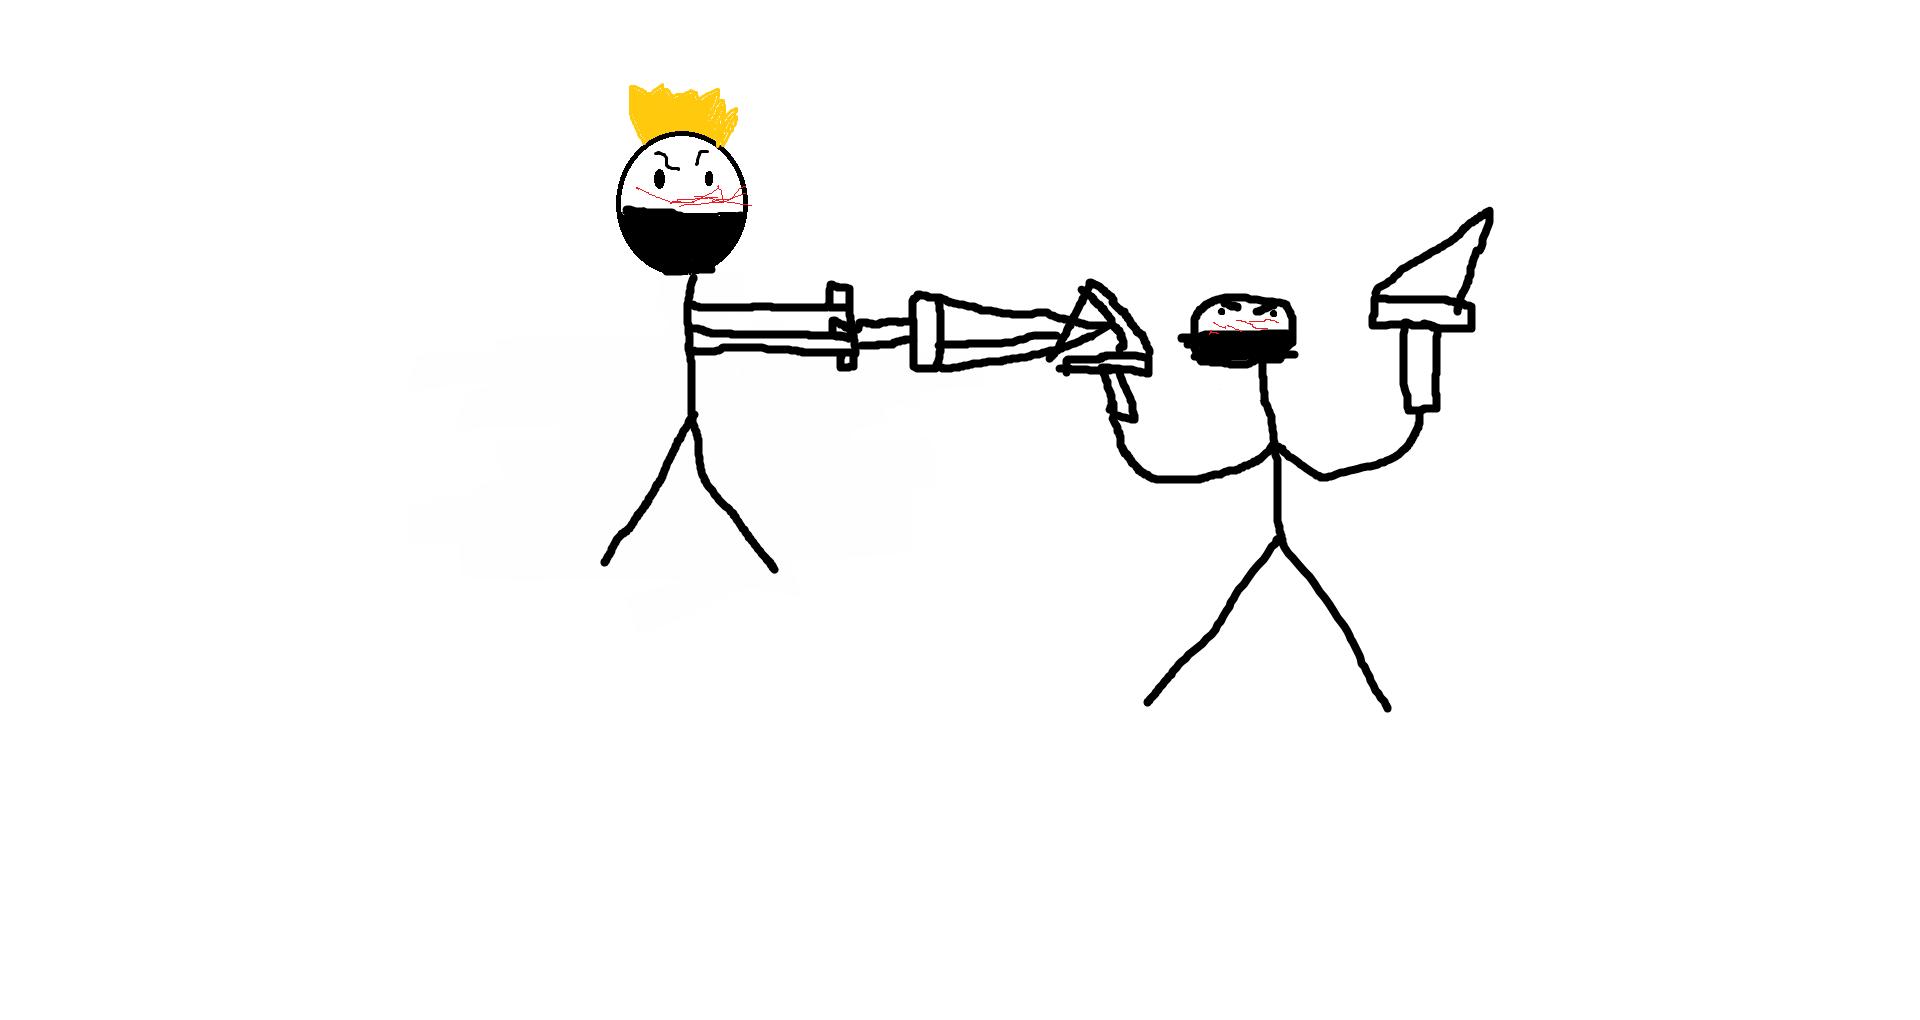 My worst drawing